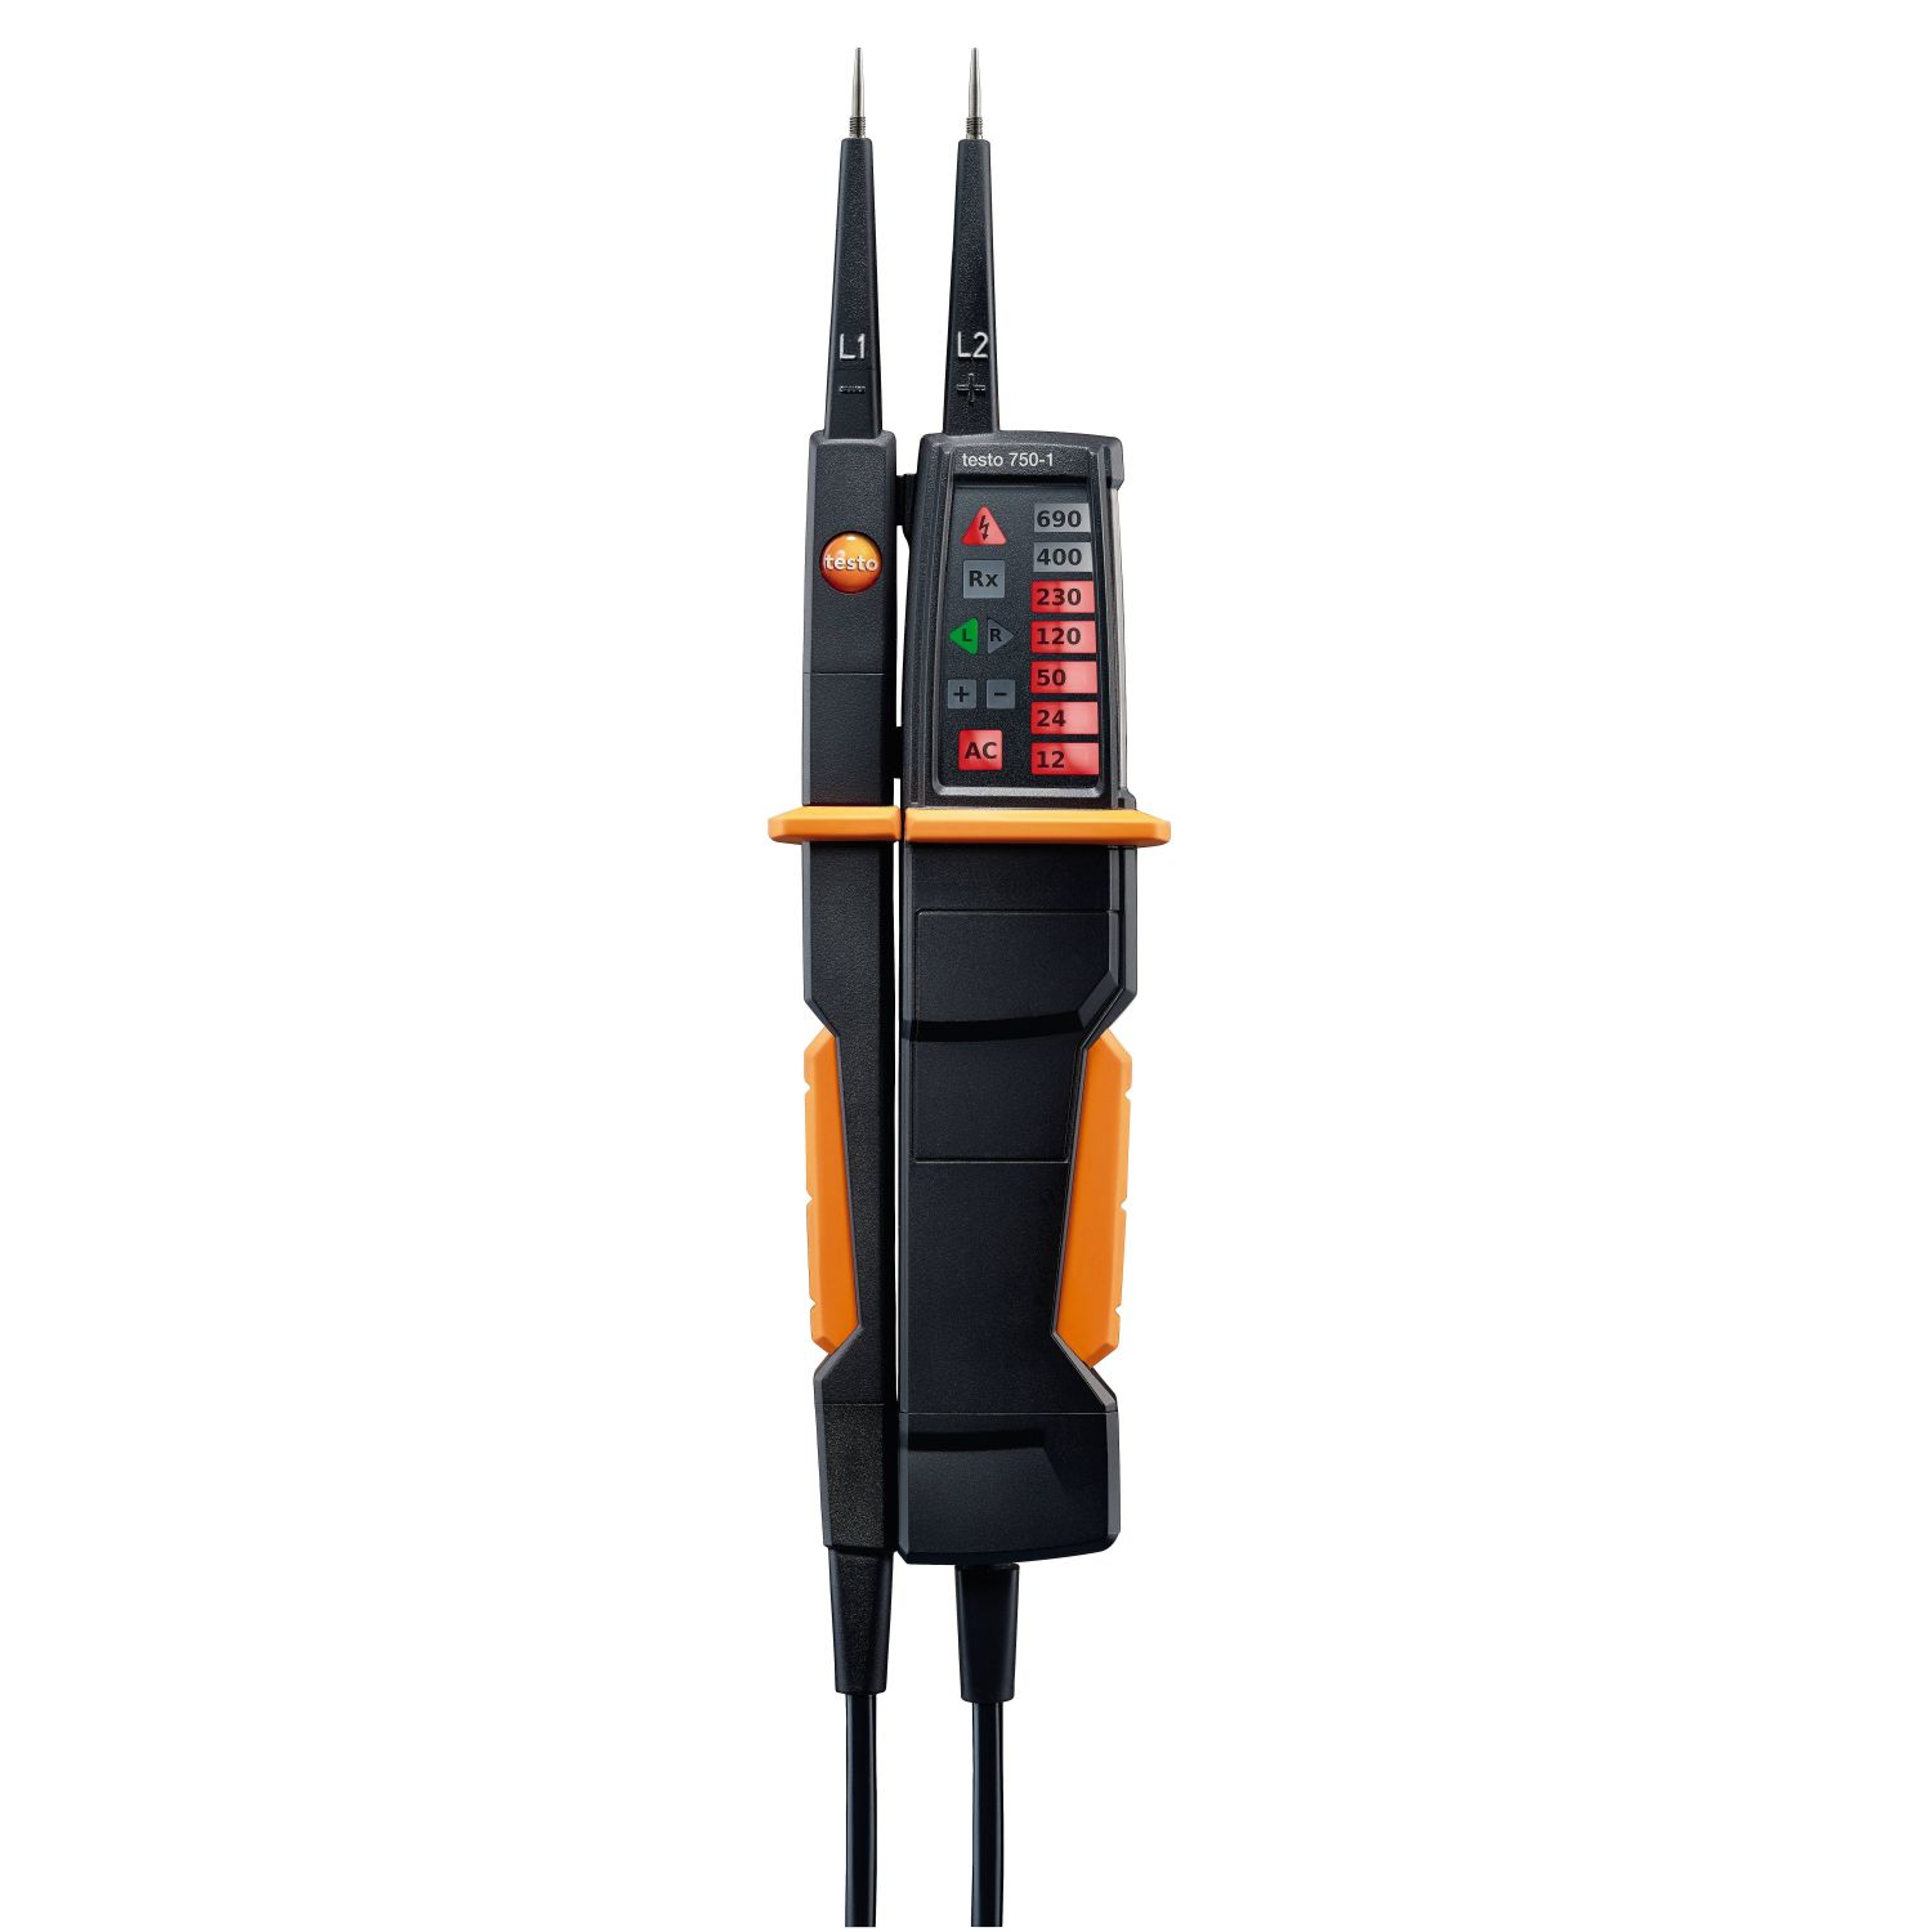 testo 750-1 voltage tester